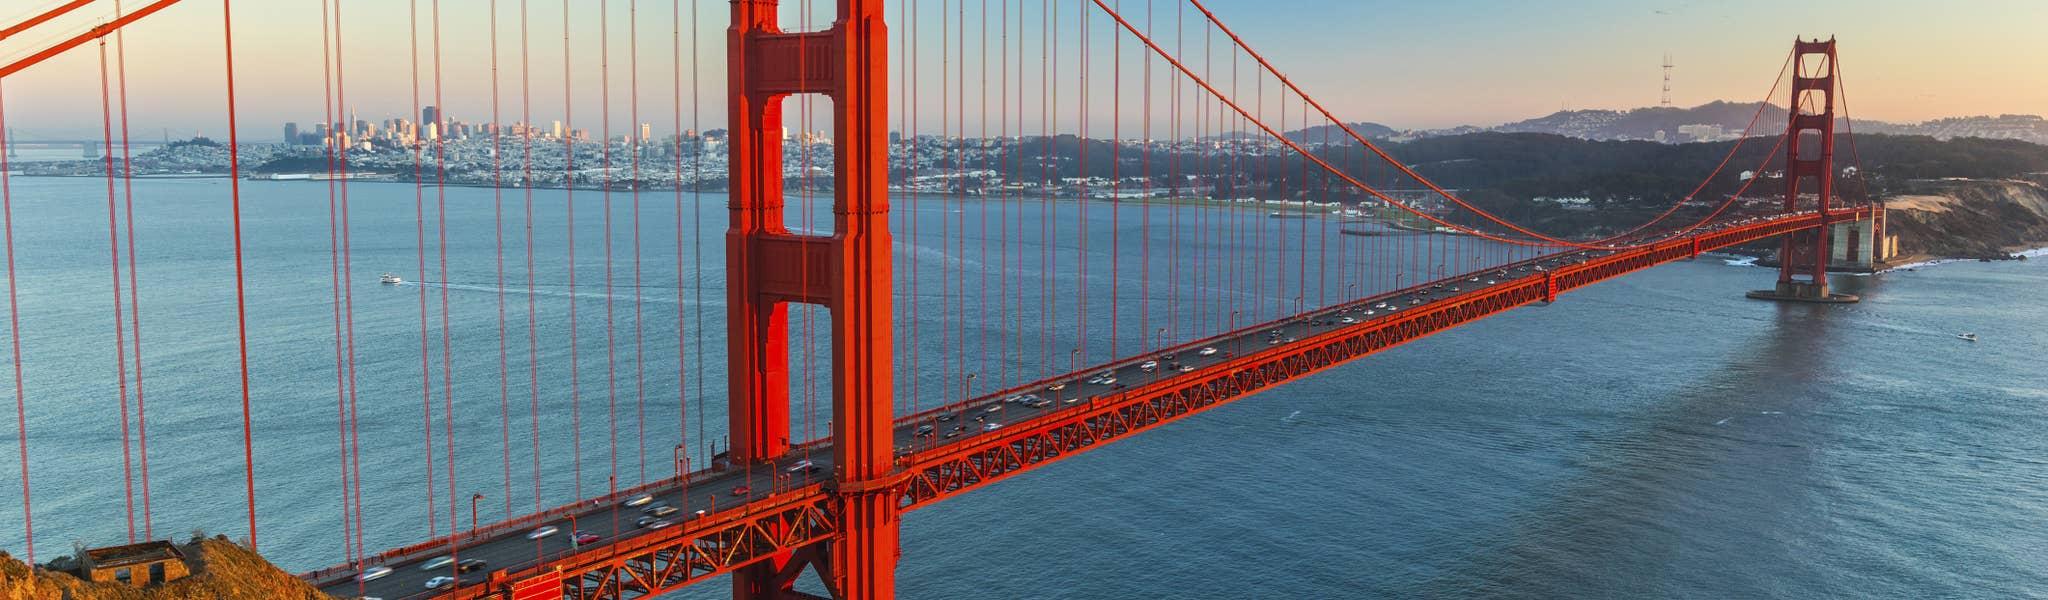 Dating σε απευθείας σύνδεση Σαν Φρανσίσκο